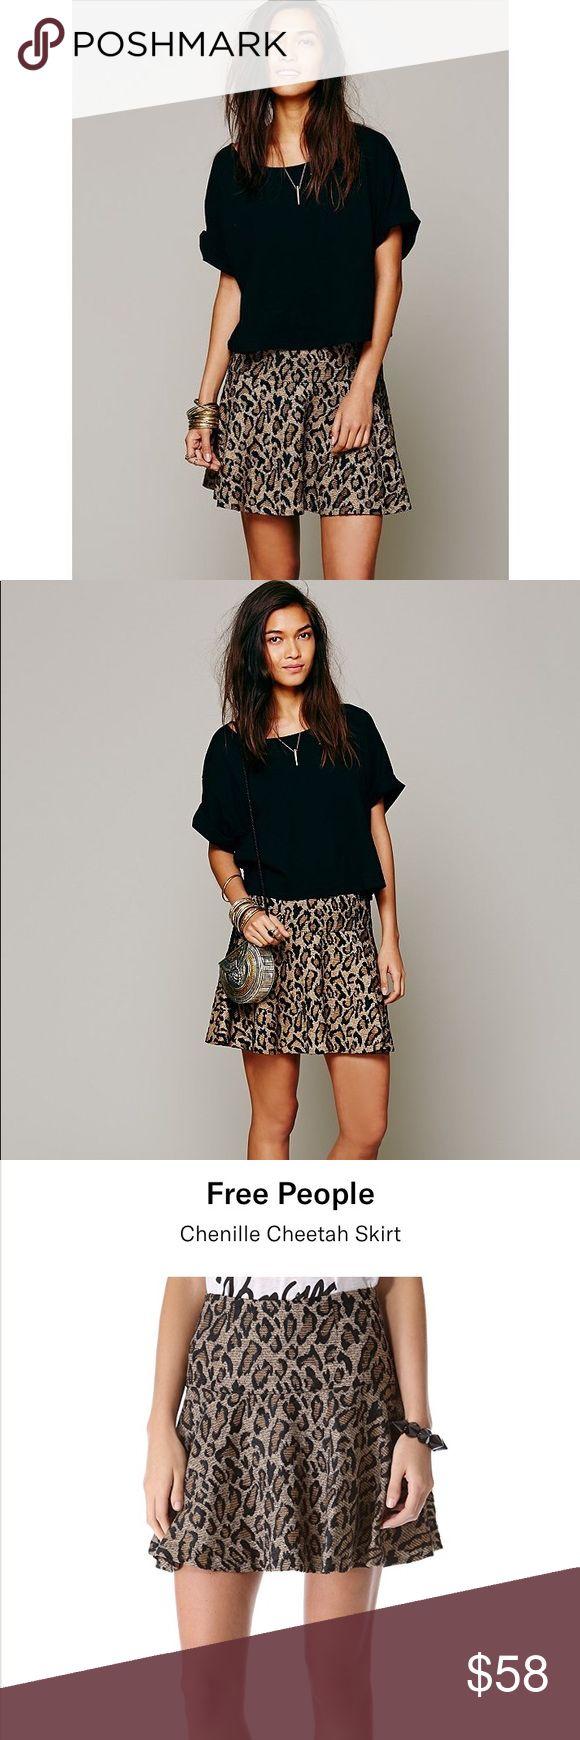 I just added this listing on Poshmark: Free People Chenille Cheetah Skirt, XS. #shopmycloset #poshmark #fashion #shopping #style #forsale #Free People #Dresses & Skirts